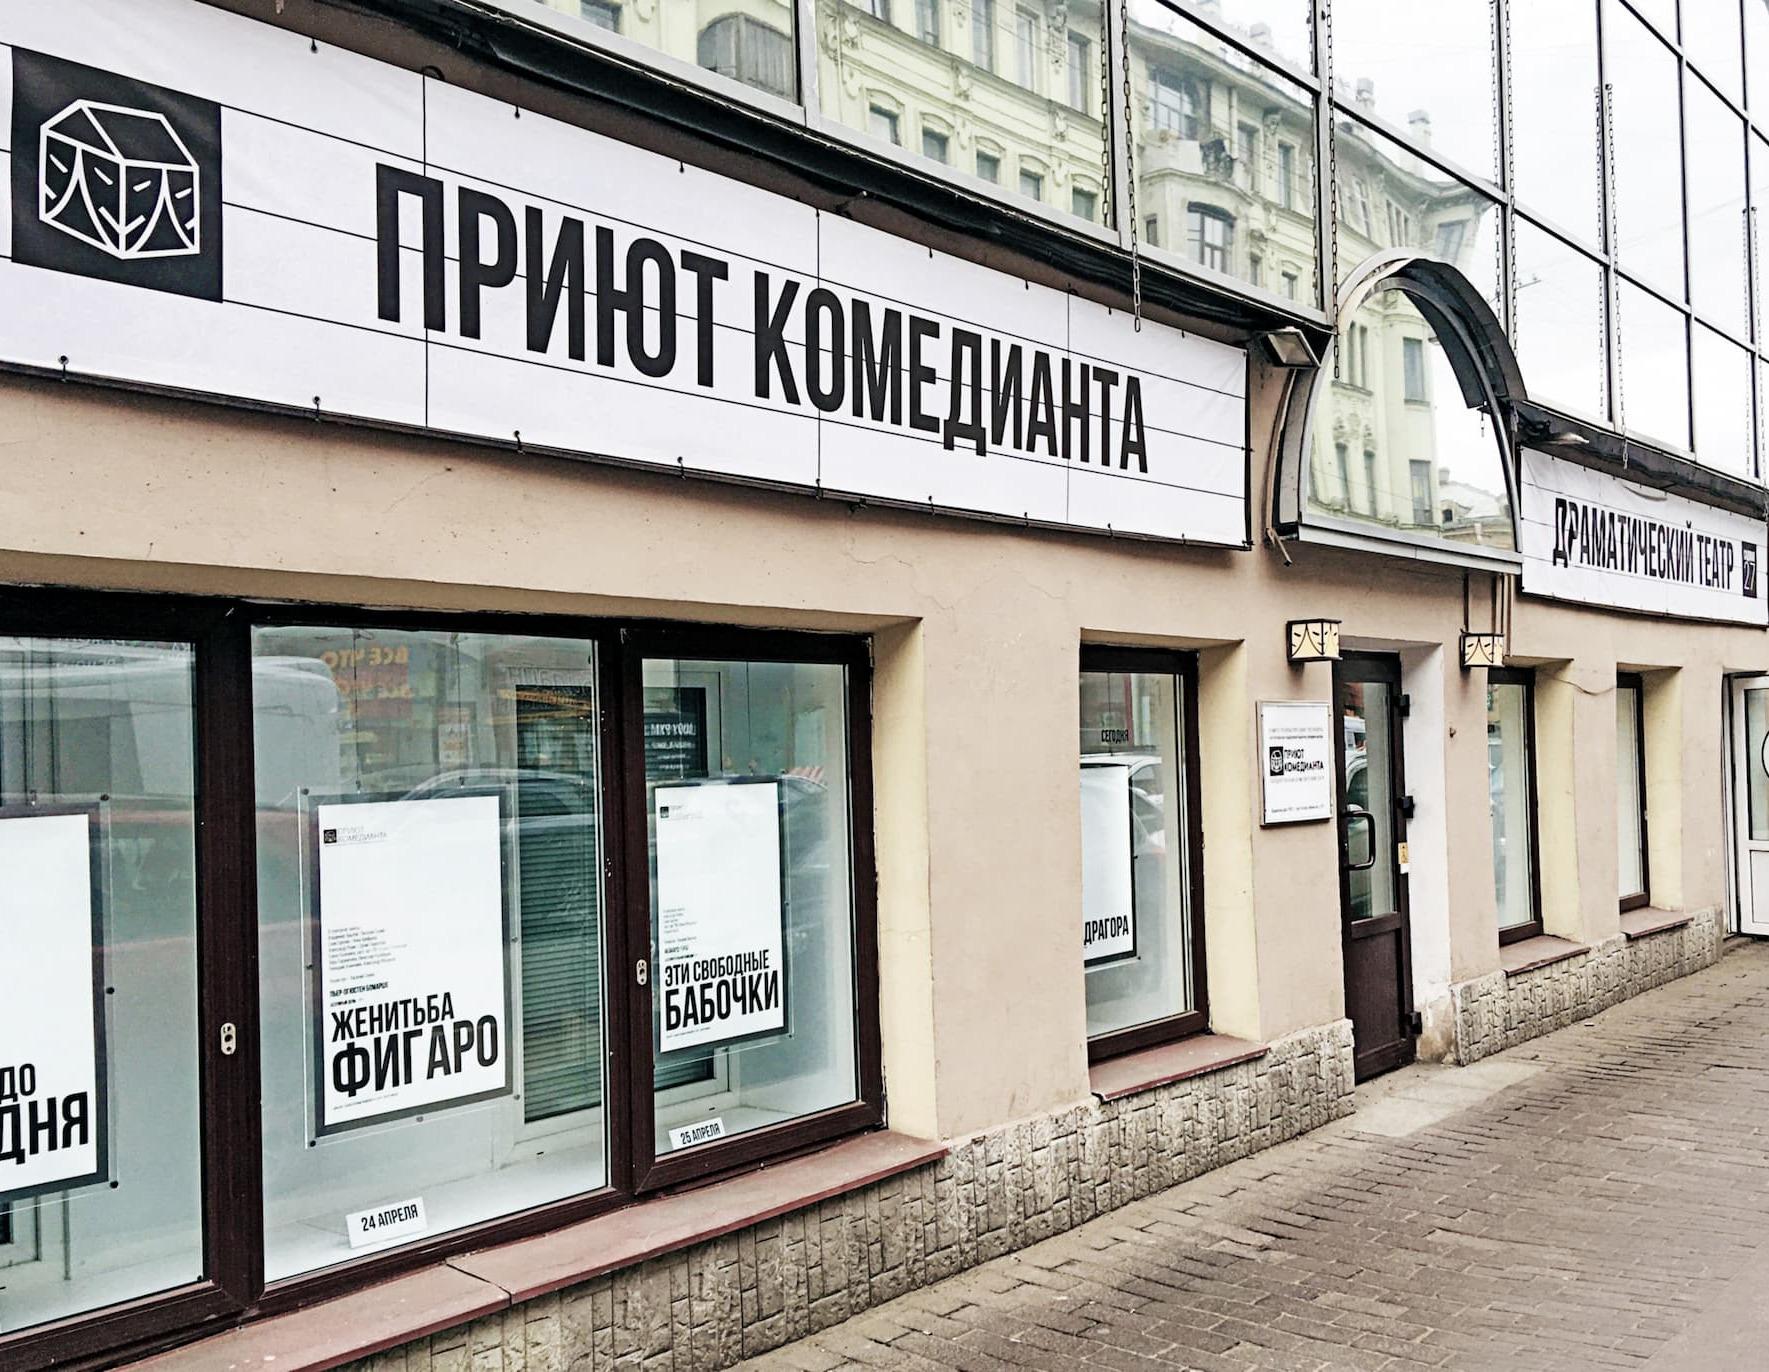 Театр Приют комедианта